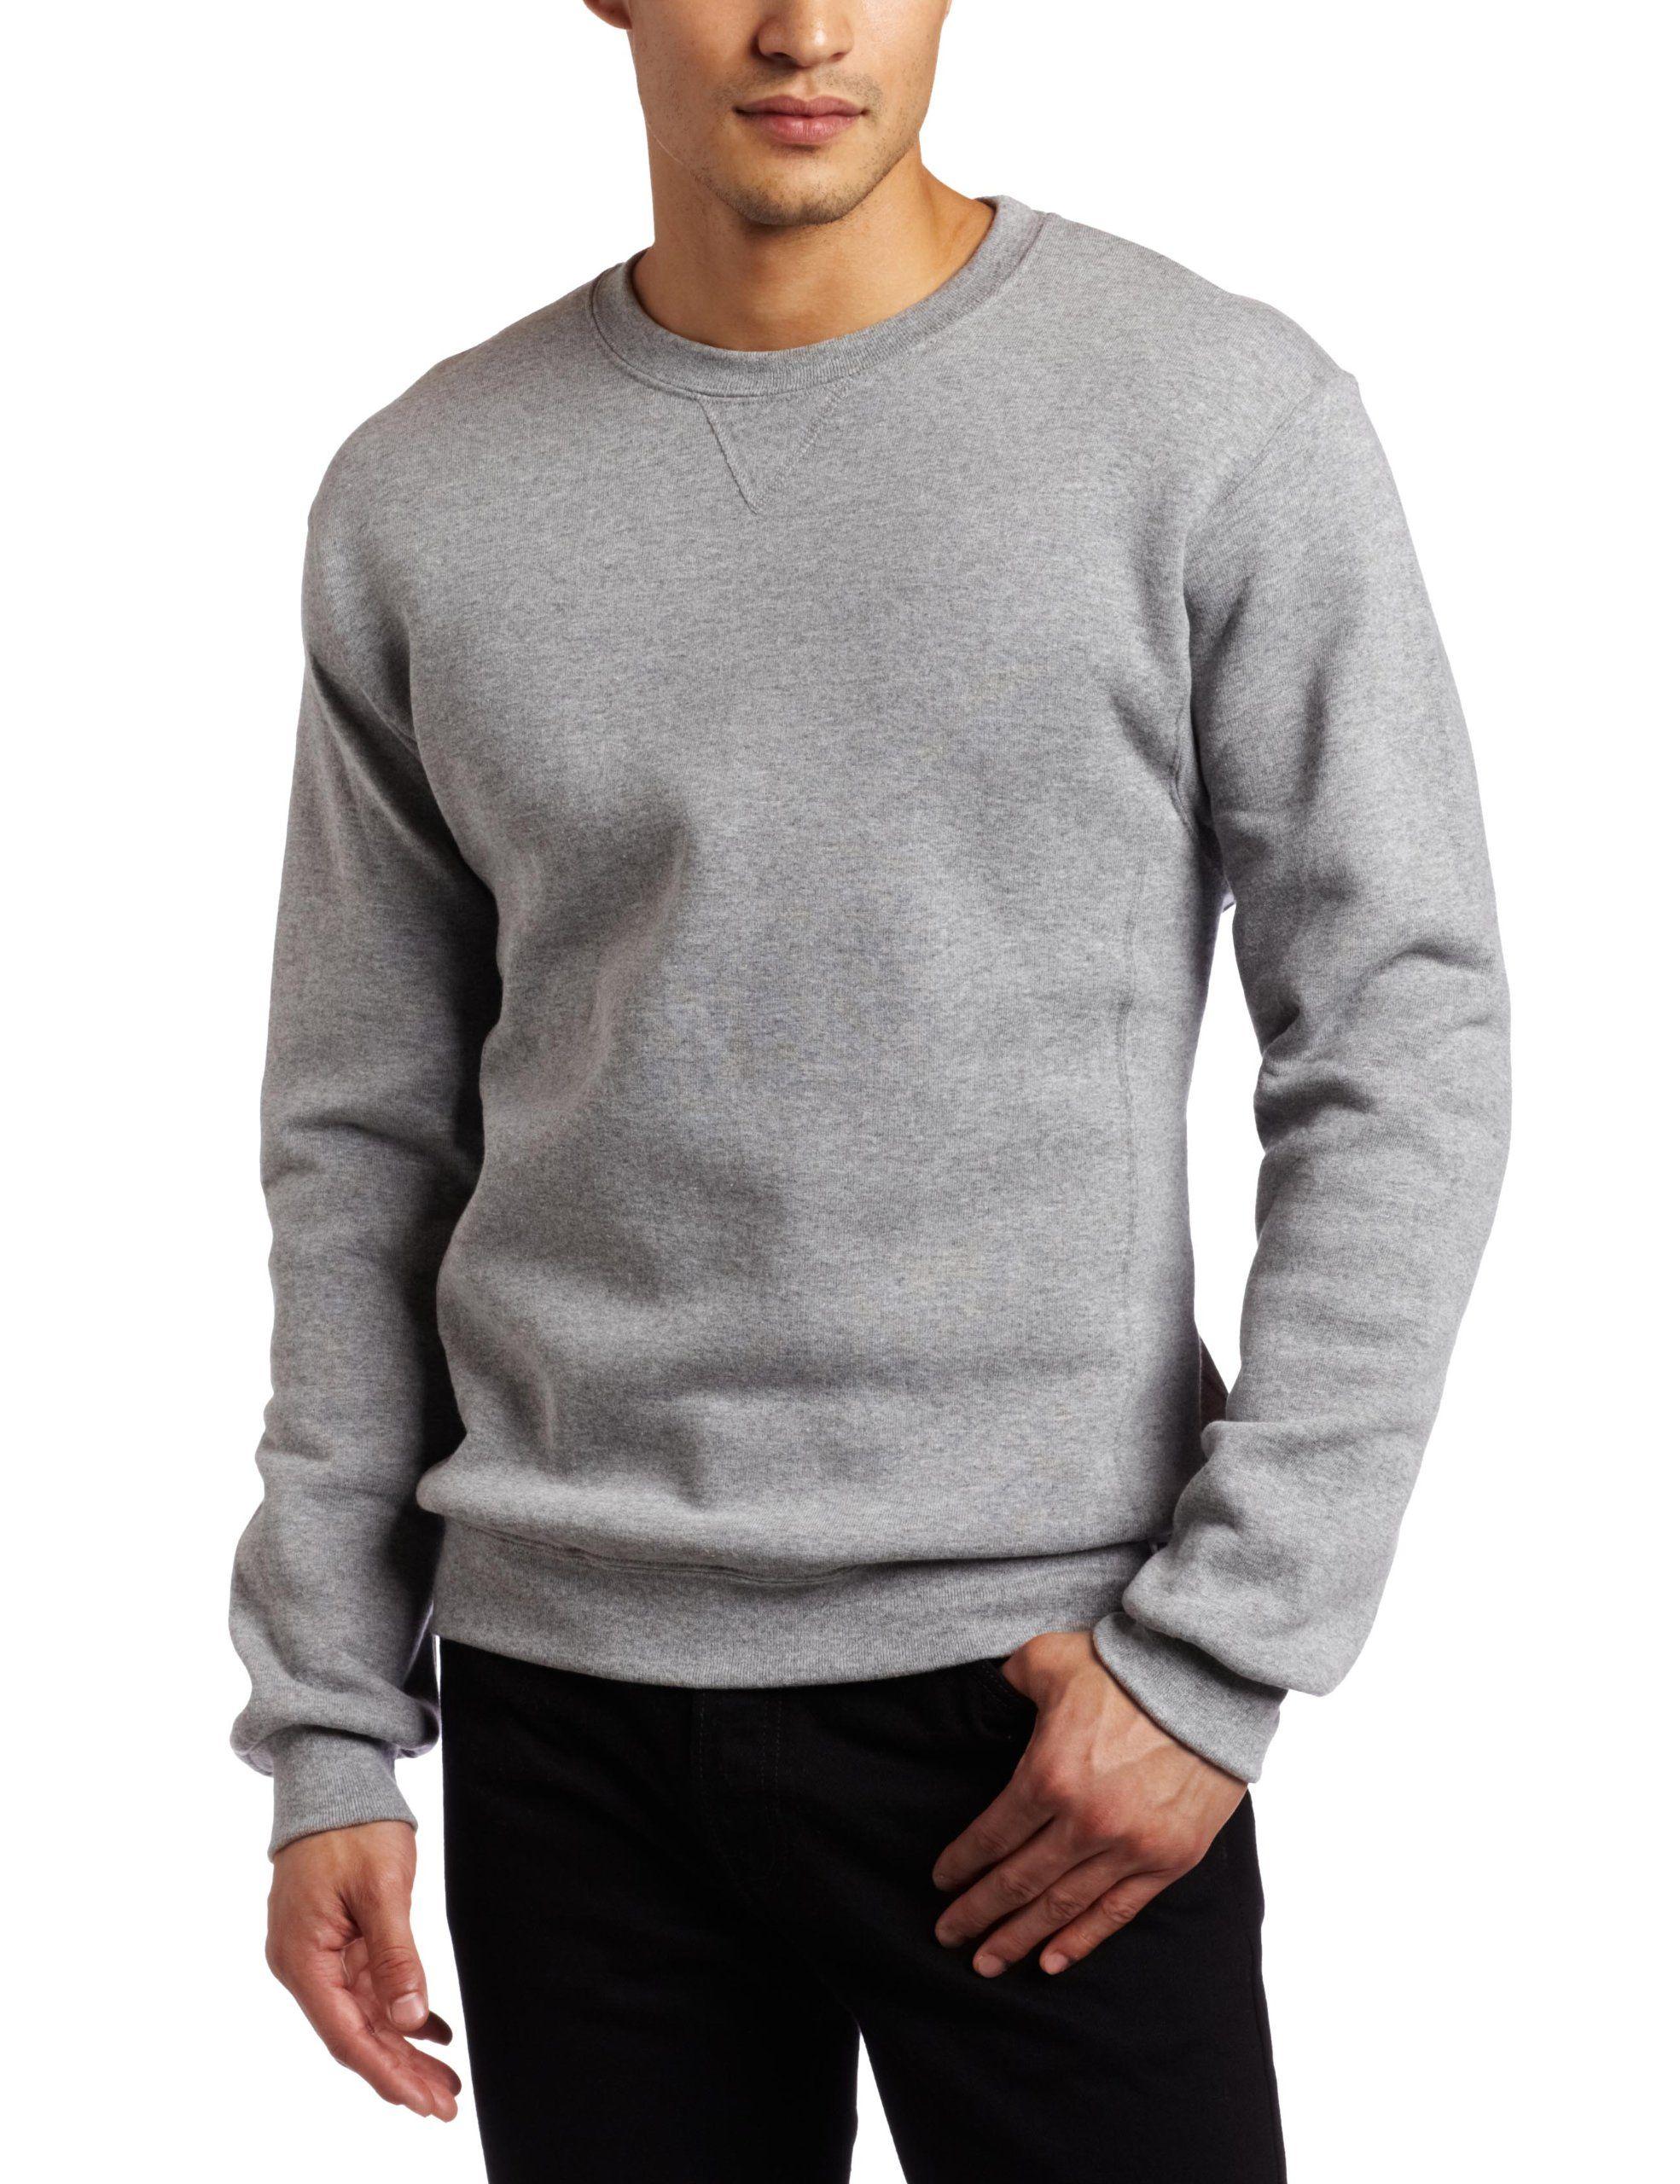 2a7d99696 Russell Athletic Men's Dri Power Fleece Crewneck Sweatshirt at Amazon Men's  Clothing store: